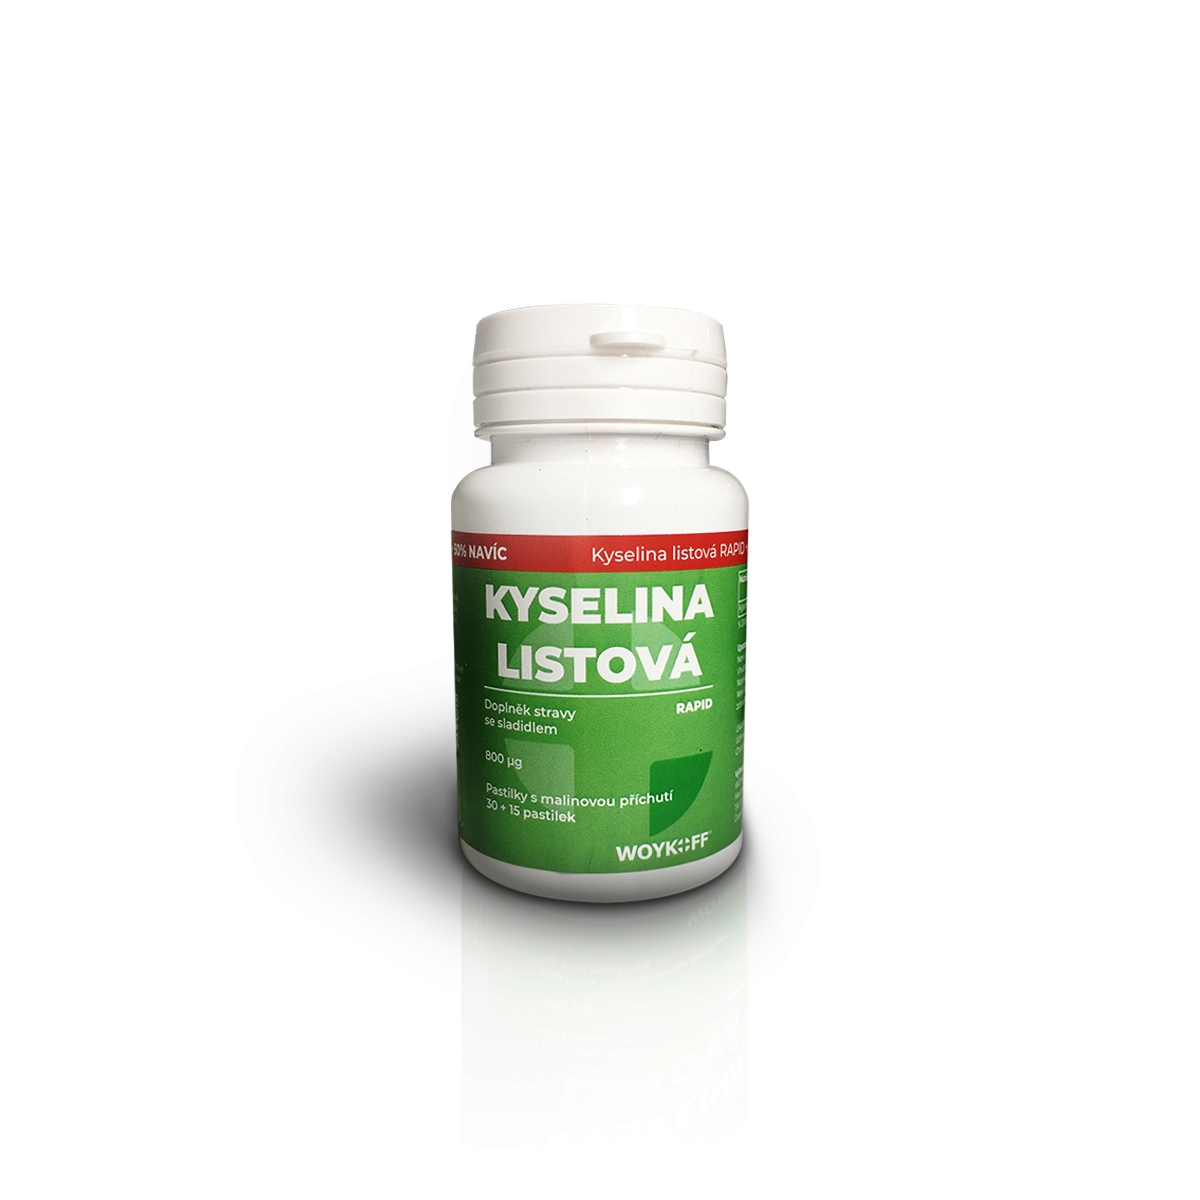 Woykoff Kyselina listová RAPID 30+15 pastilek